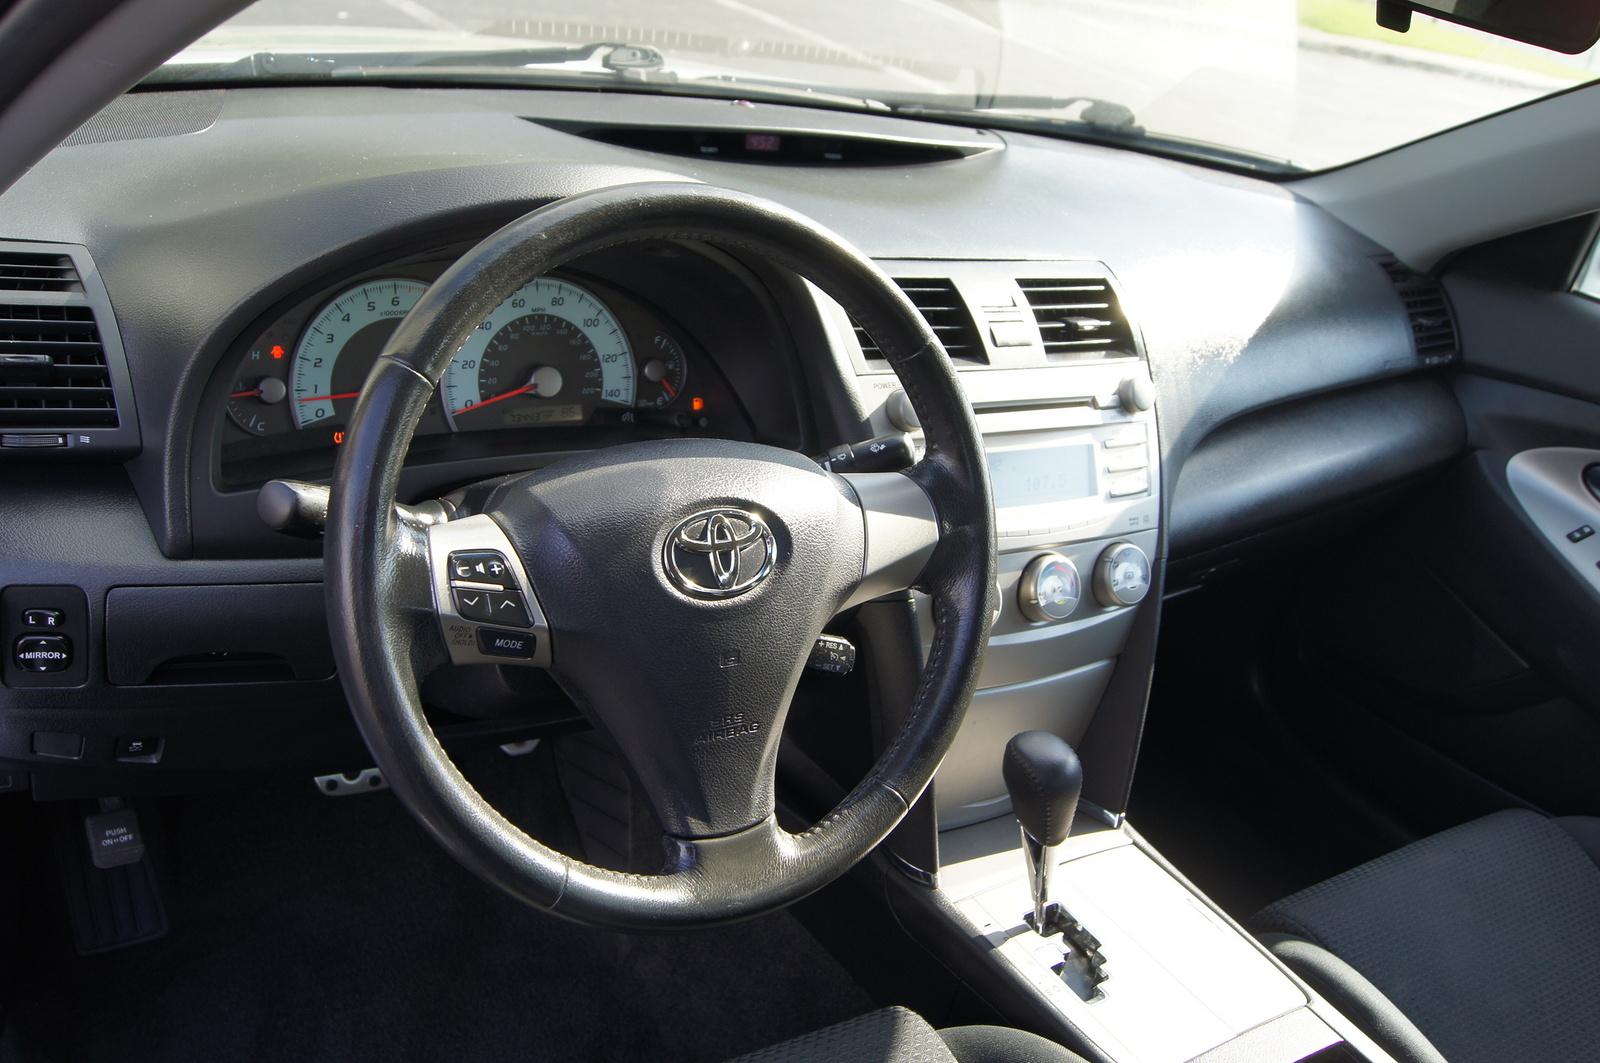 2010 Toyota Camry Pictures Cargurus